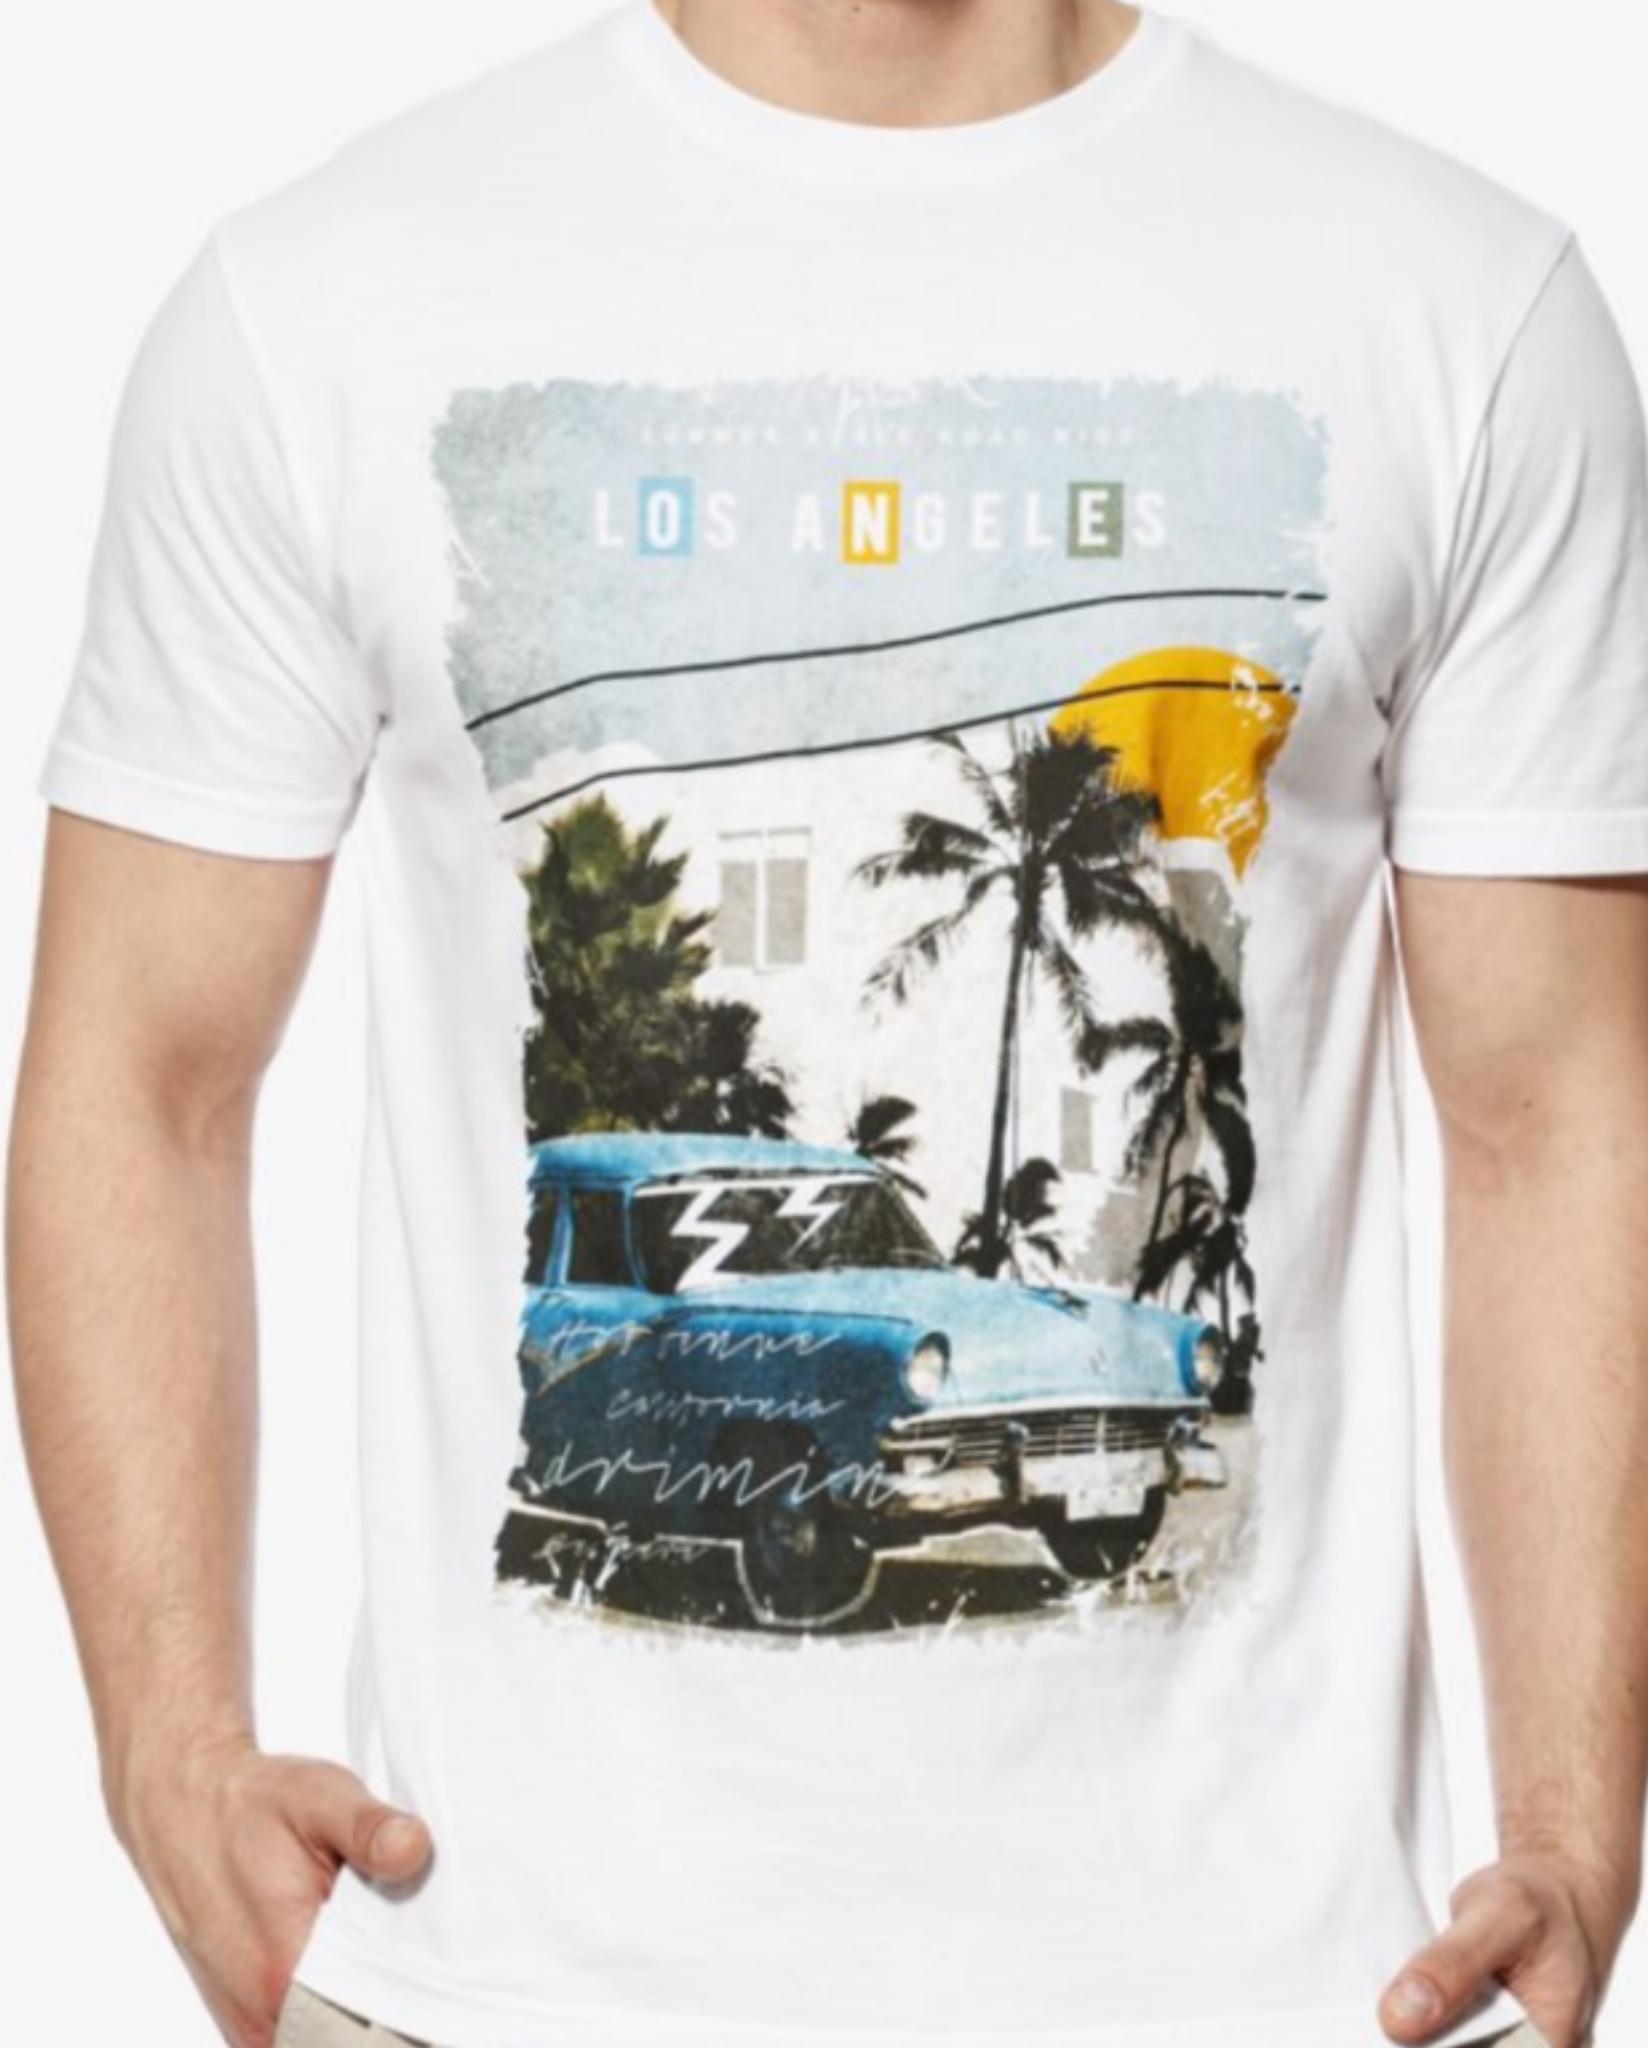 T-shirty męskie  Umbro, Freewar, Lotto galeriamarek.pl